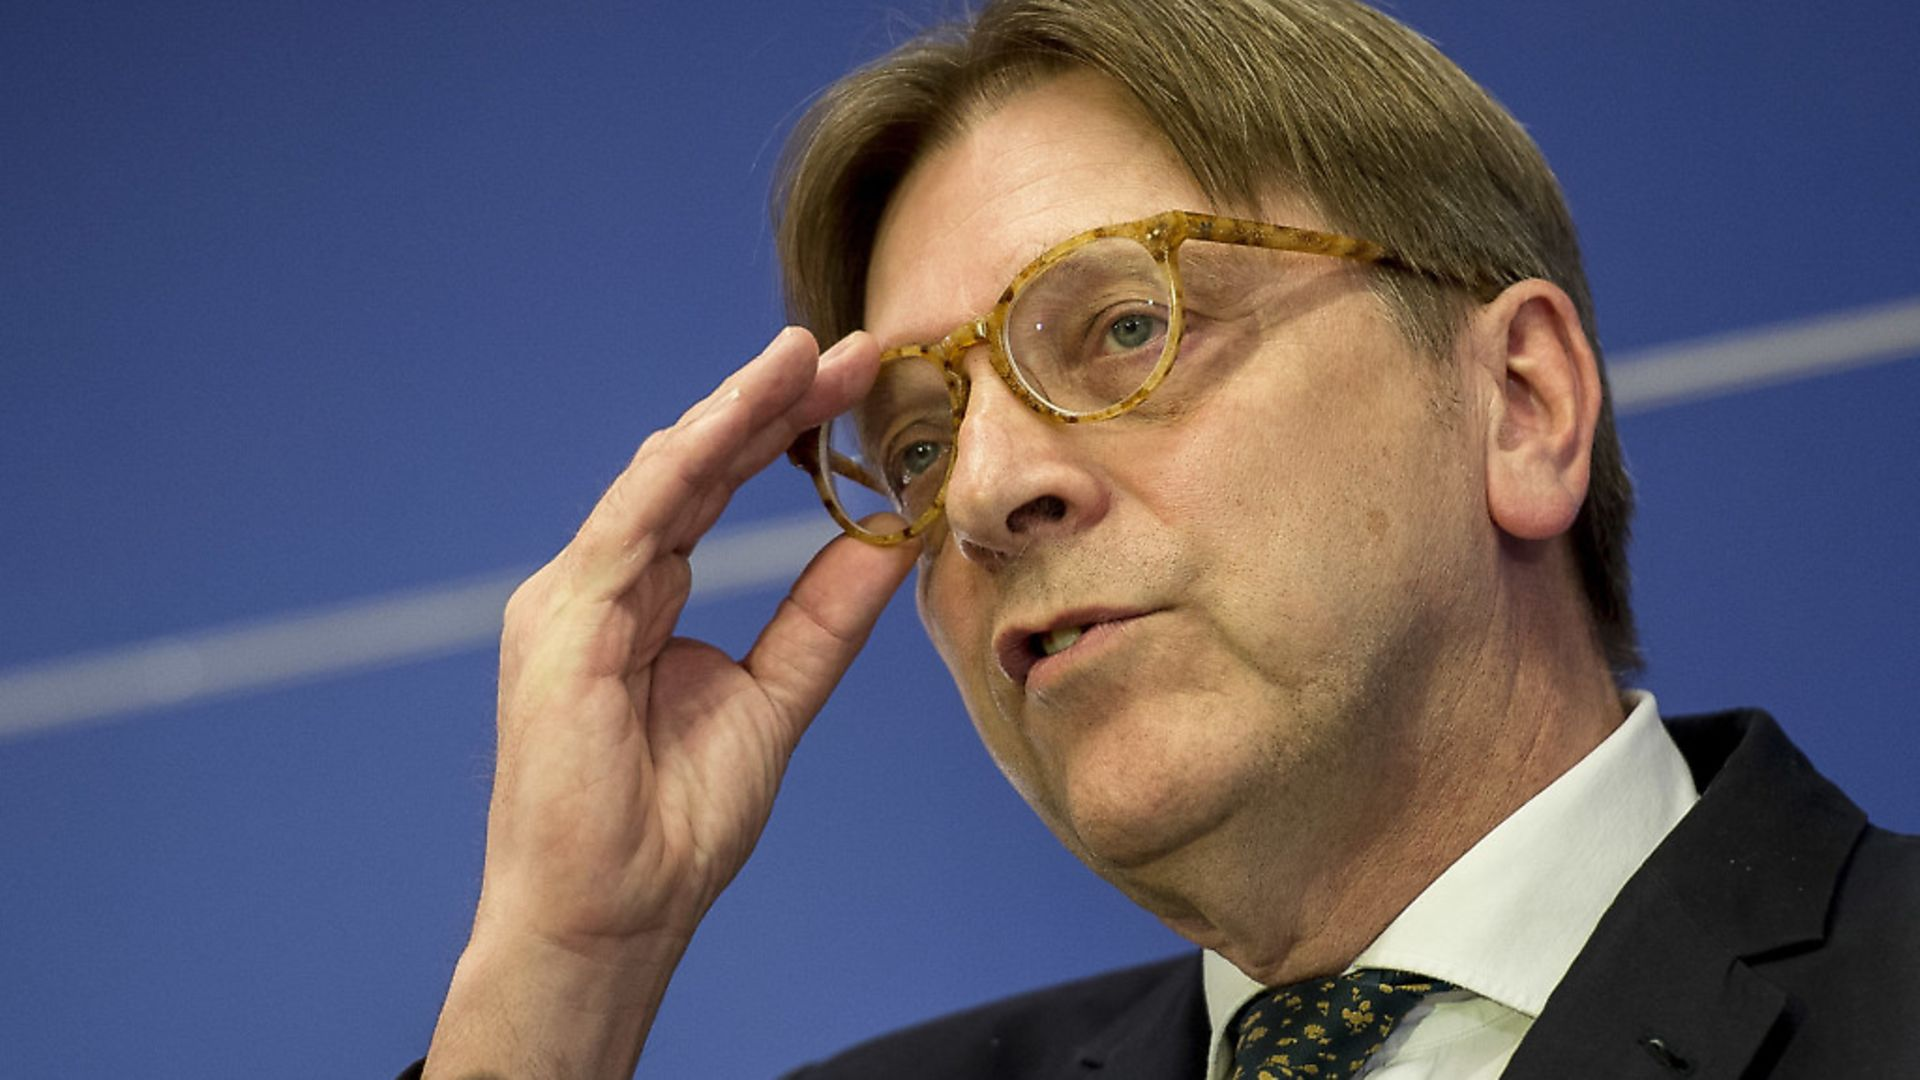 European Parliament coordinator for Brexit, Guy Verhofstadt. - Credit: DPA/PA Images